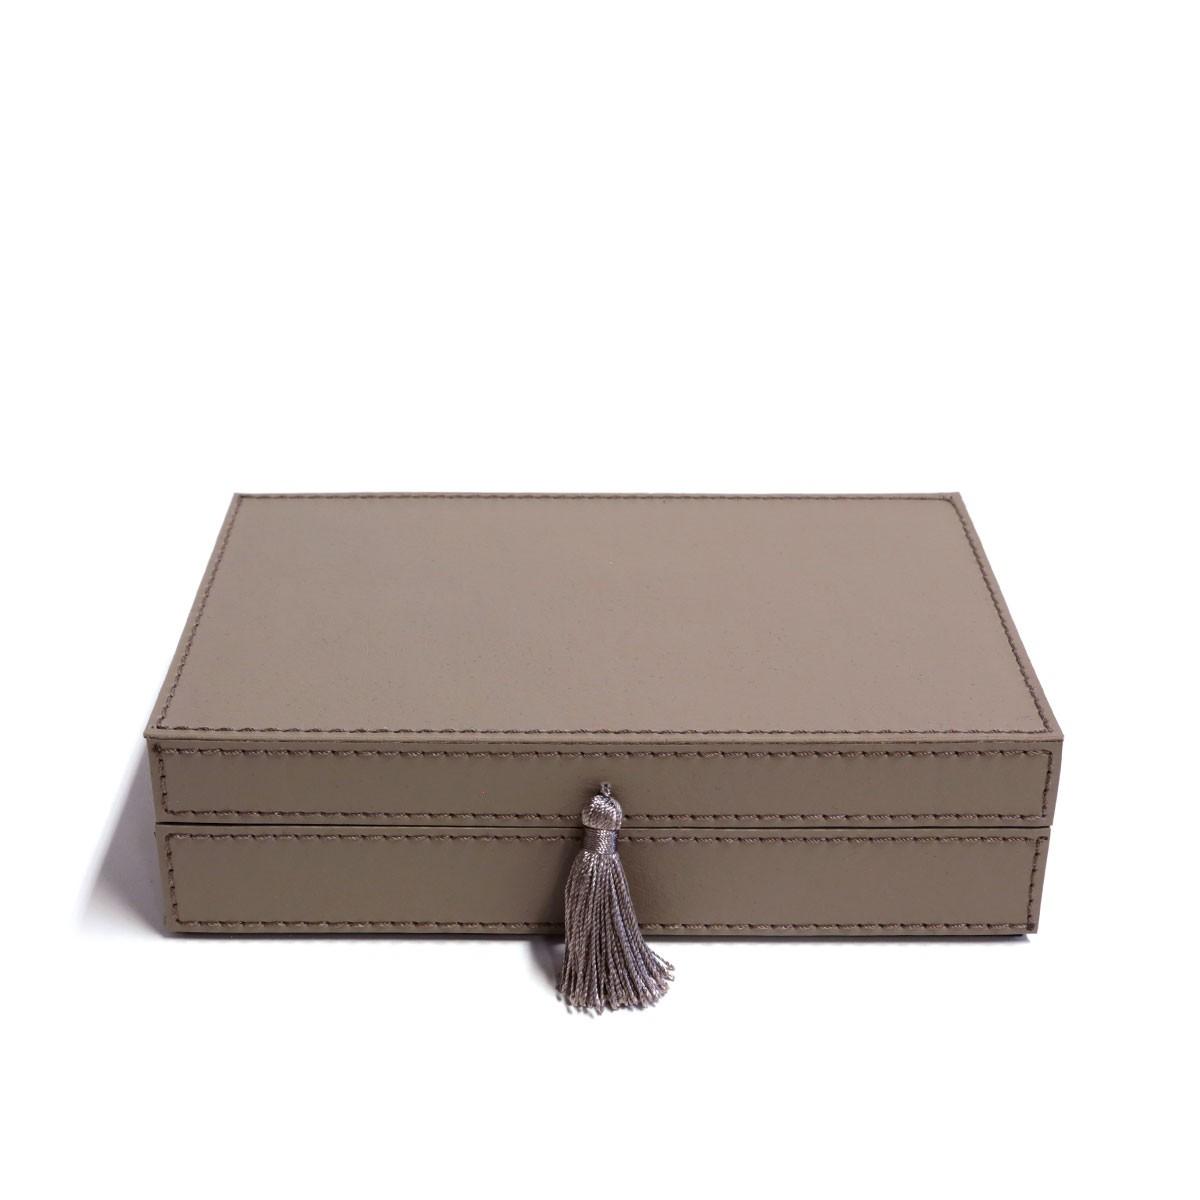 Caixa porta joias (Montana Fendi)